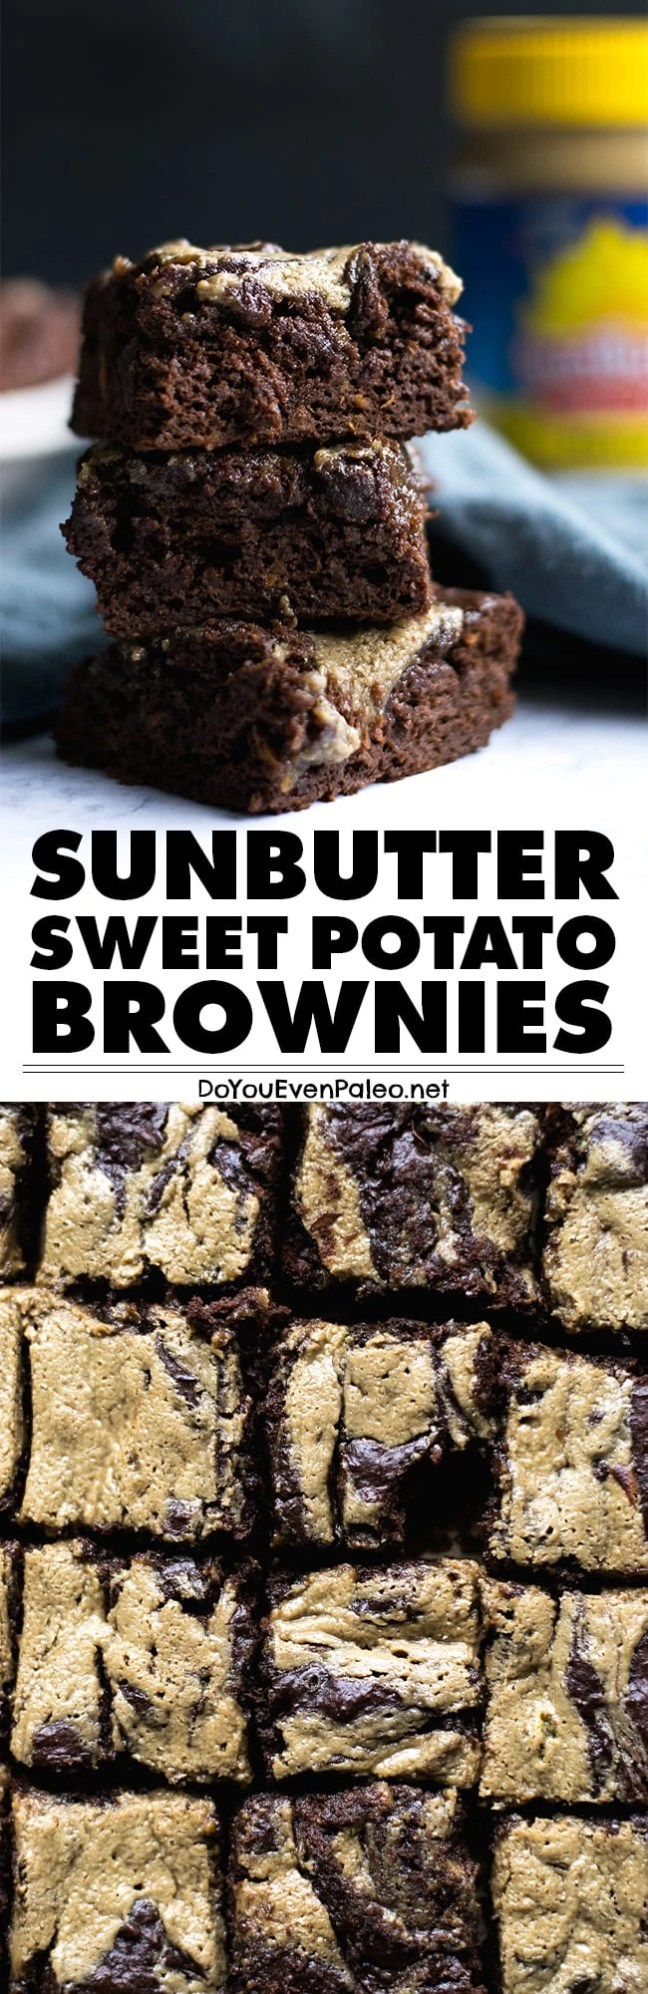 Fudgy Paleo Sunbutter Sweet Potato Brownies - complete with a Sunbutter swirl! Nut free, gluten free, paleo, vegan | DoYouEvenPaleo.net